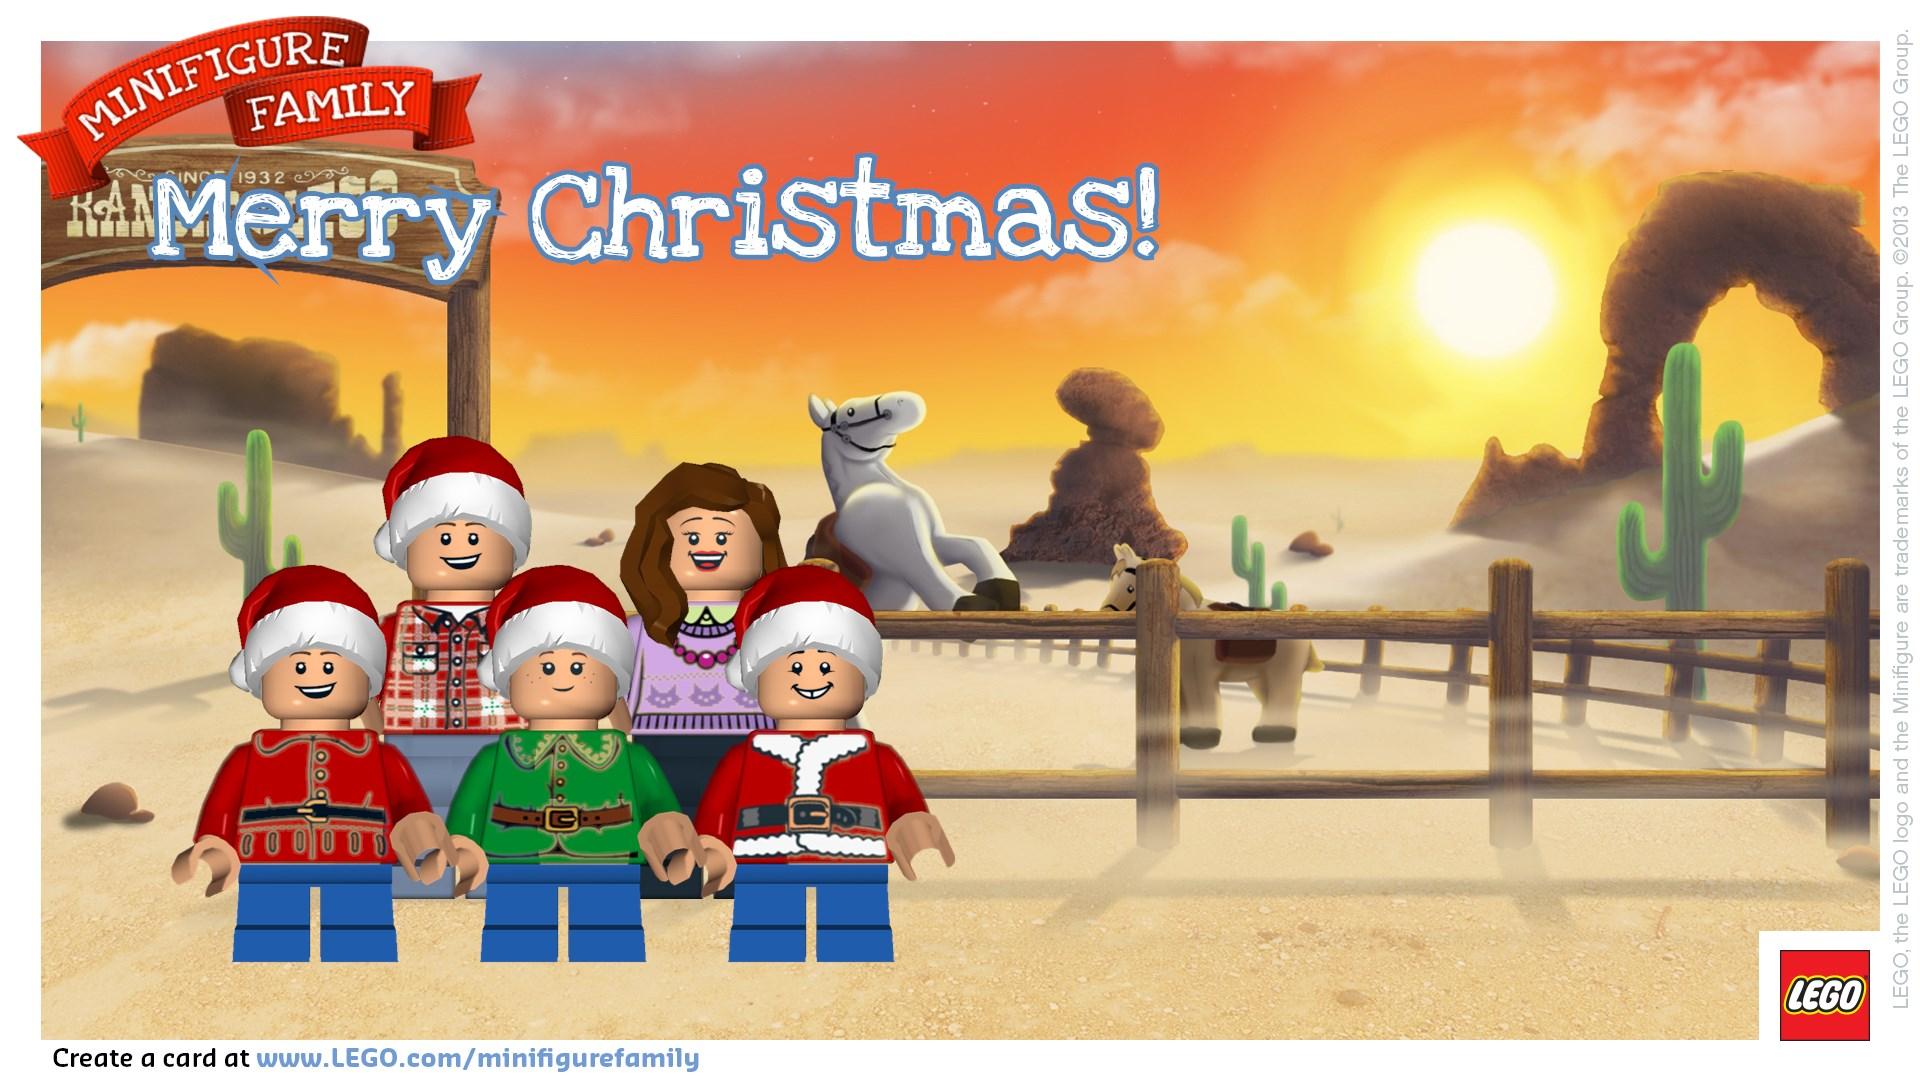 Make a LEGO Minifigure Holiday Card!